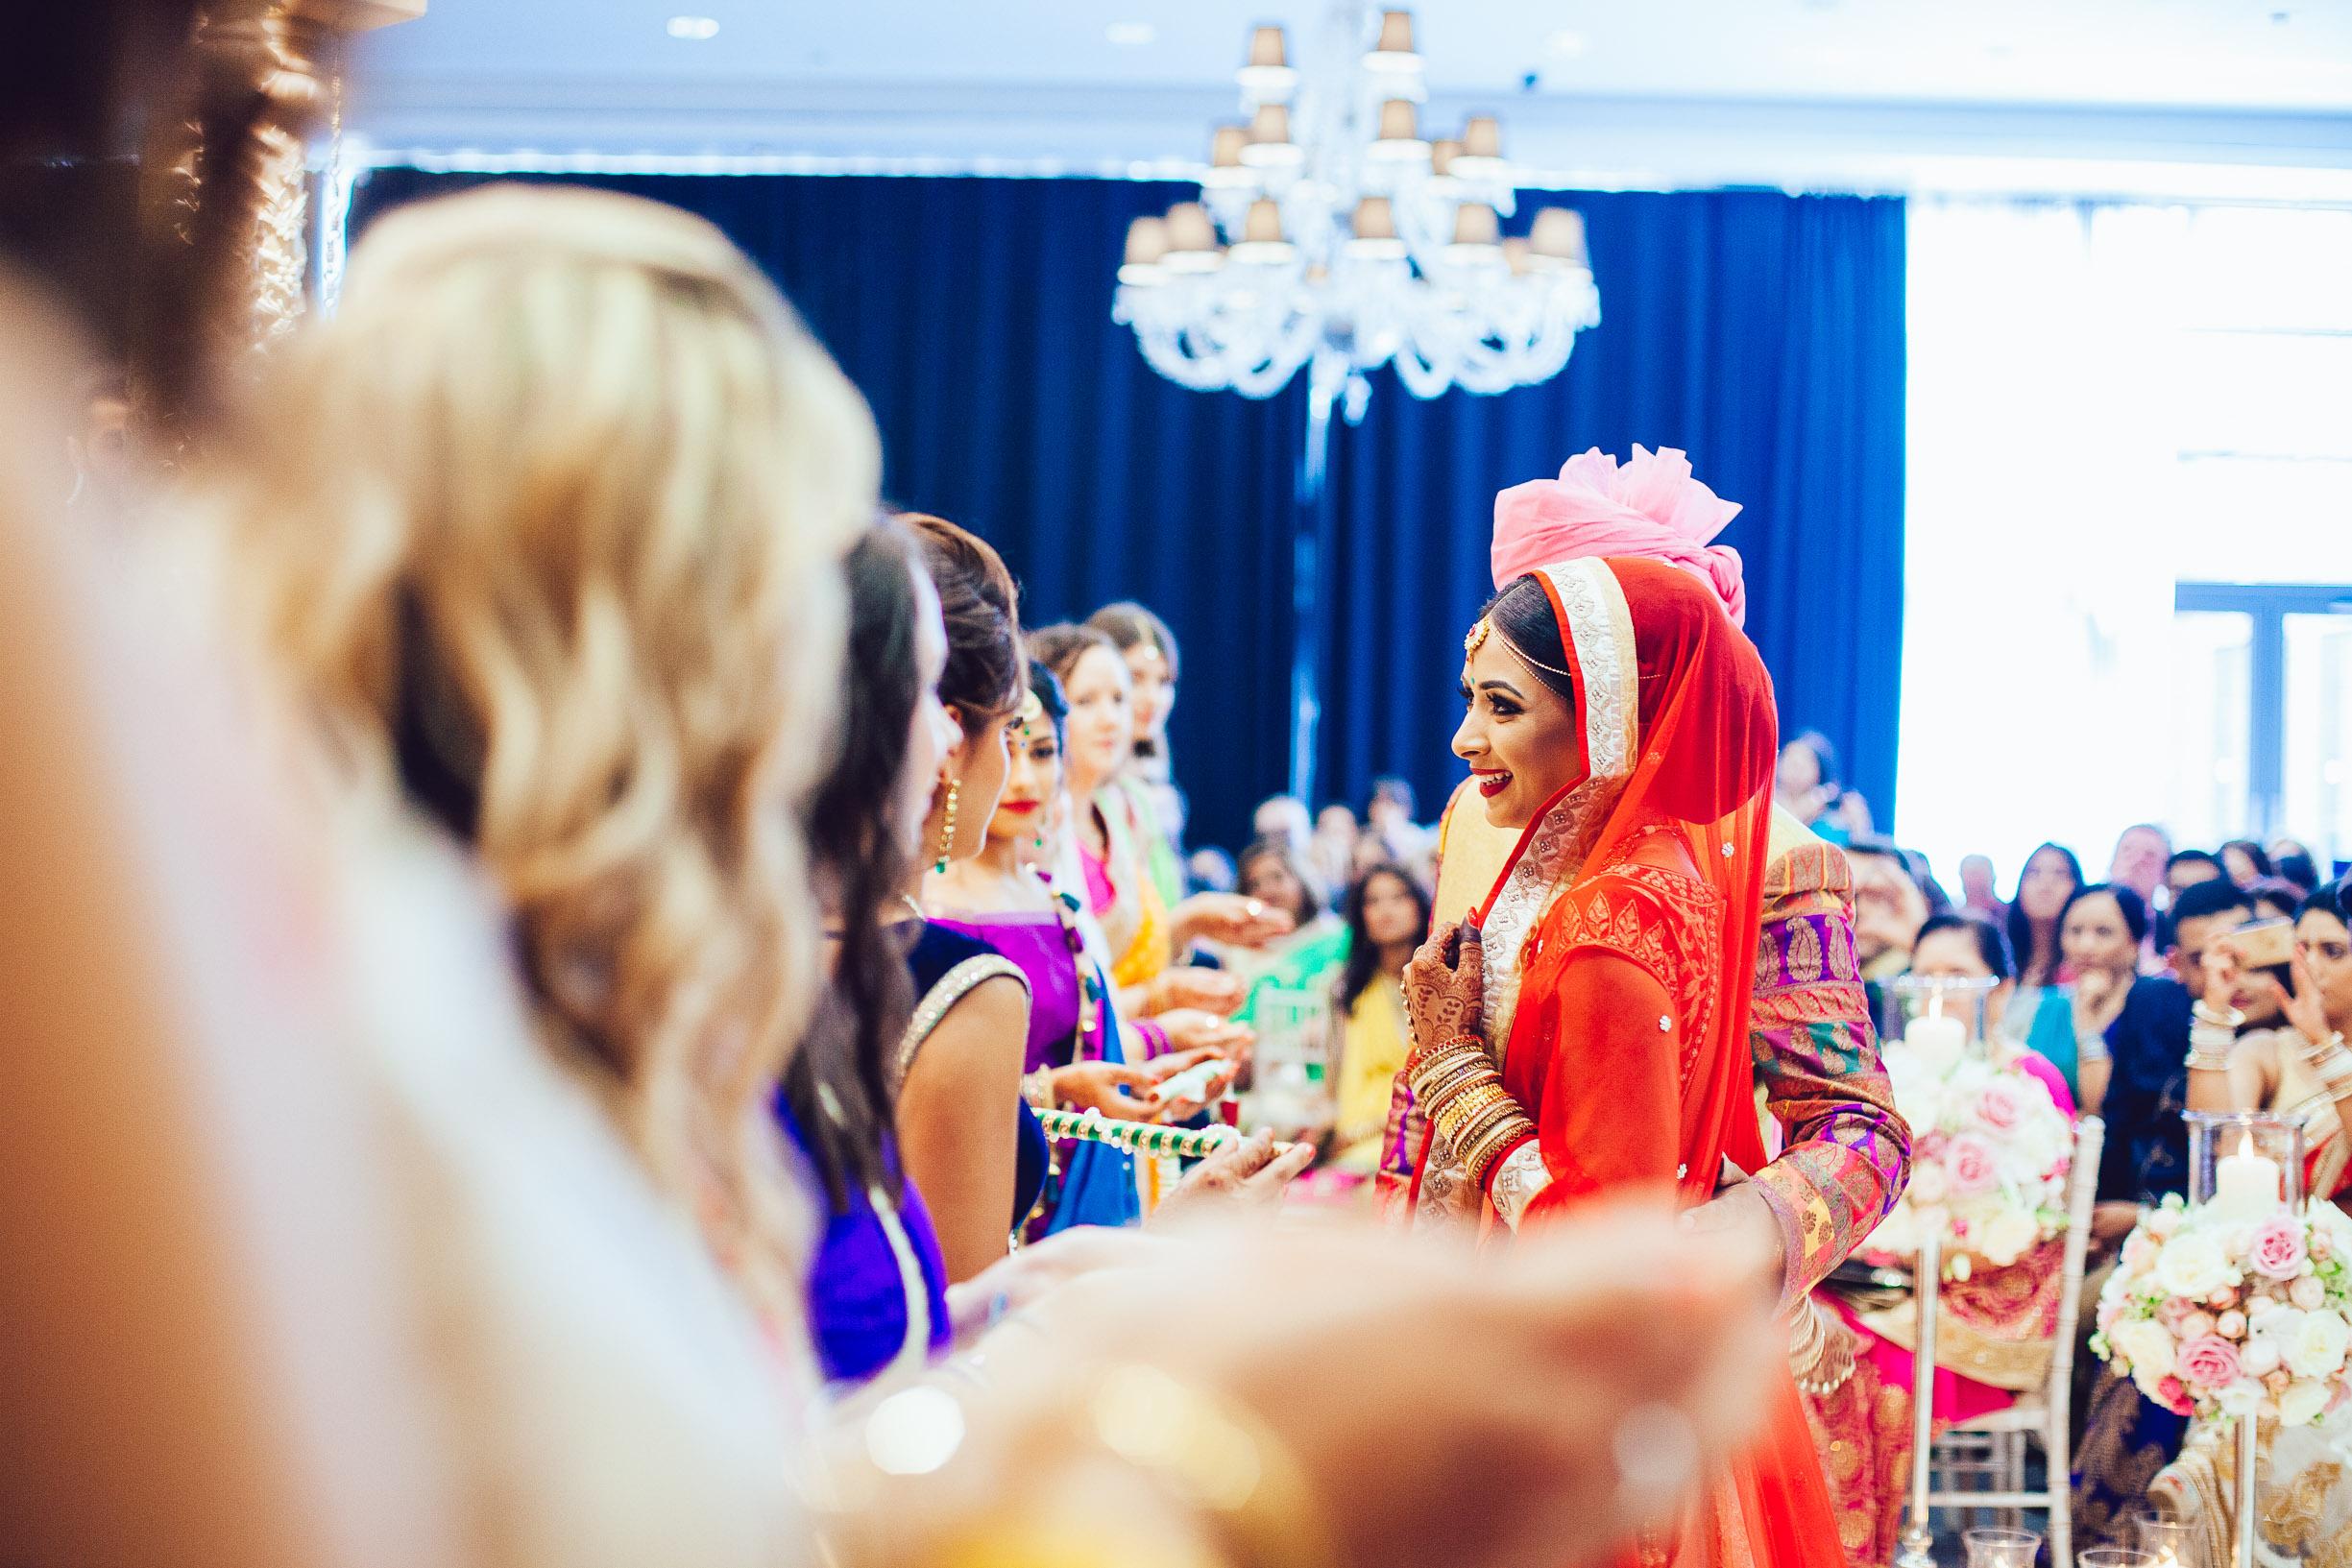 amit&ceema_eden_moments_wedding_photography-10